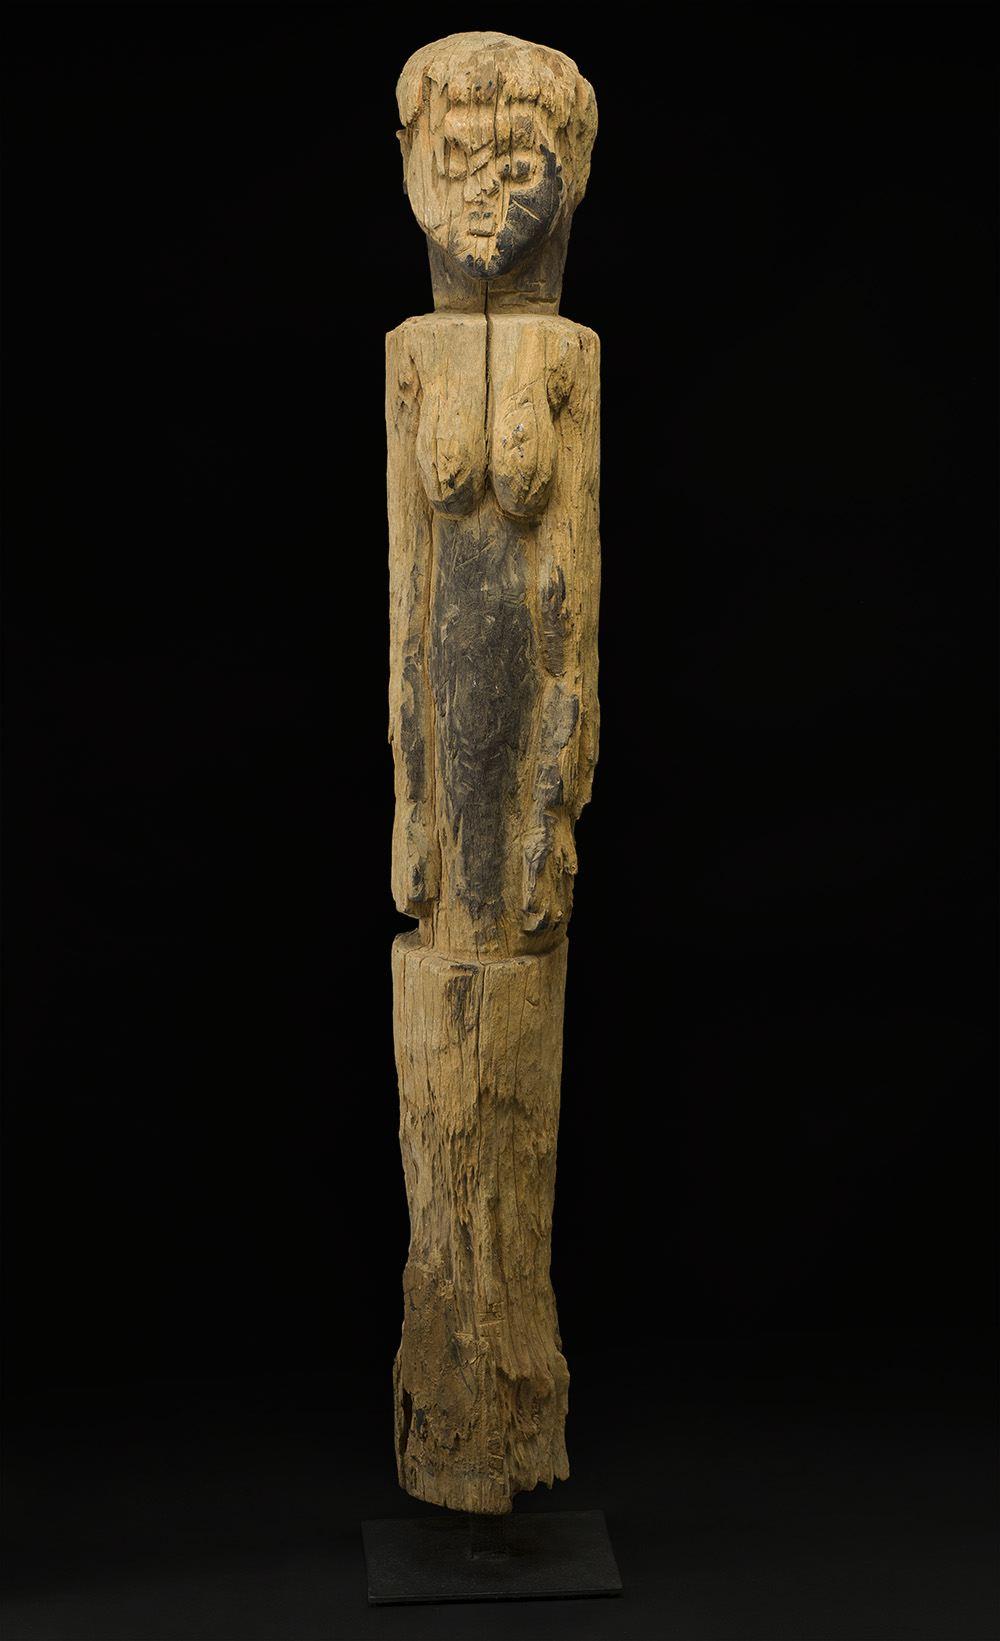 Africa    Bocio - Ewe People - Togo  , Early 20th C. Wood 59.5 x 8 x 8 inches 151.1 x 20.3 x 20.3 cm Af 335